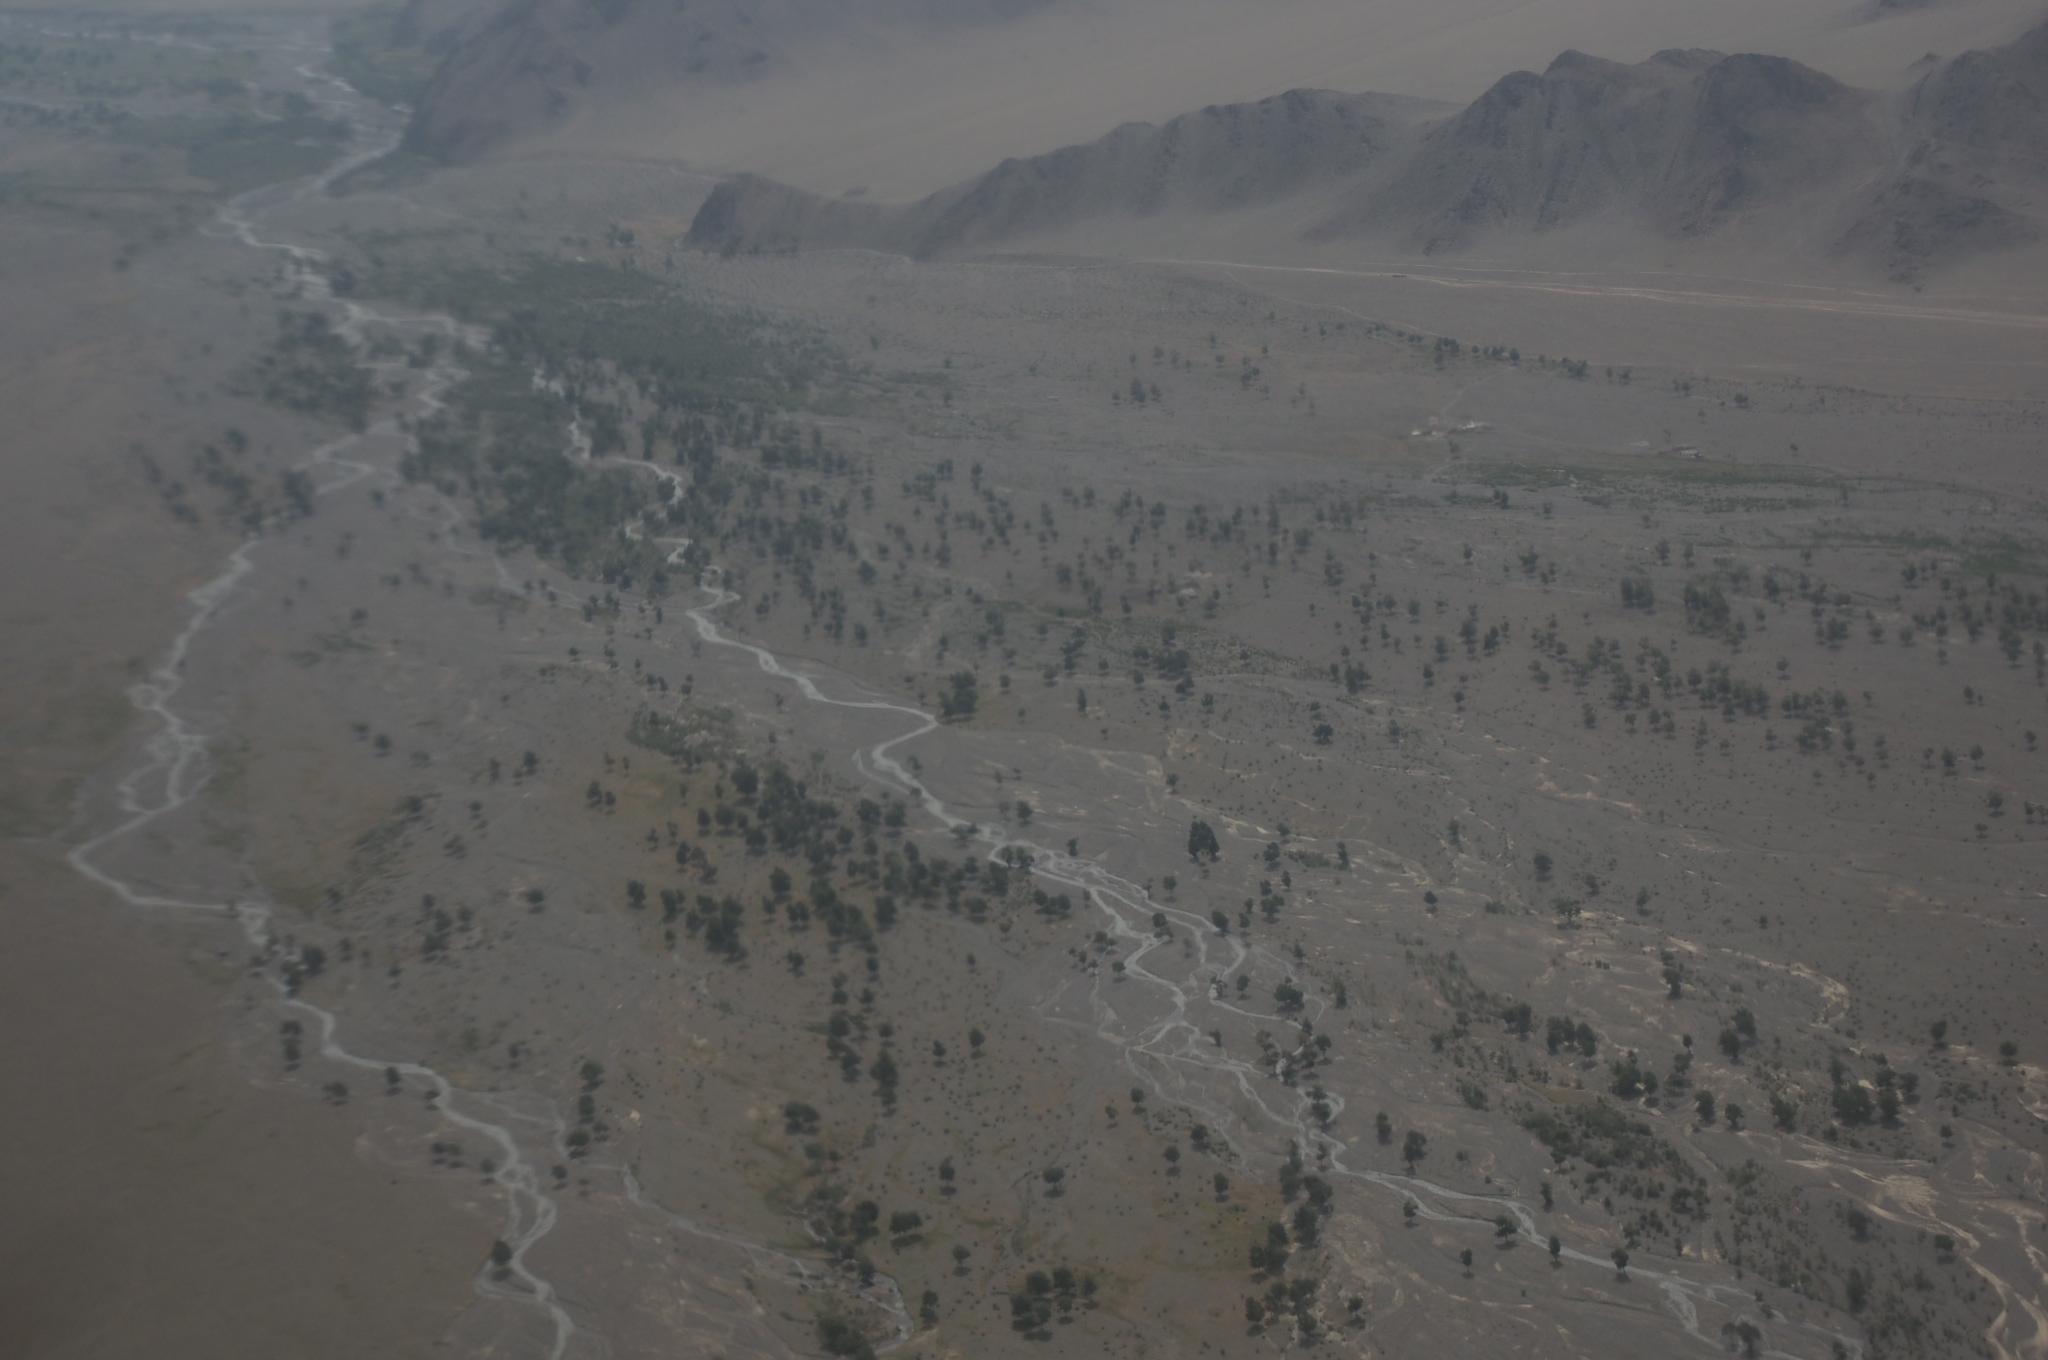 Westmongolische Wüste